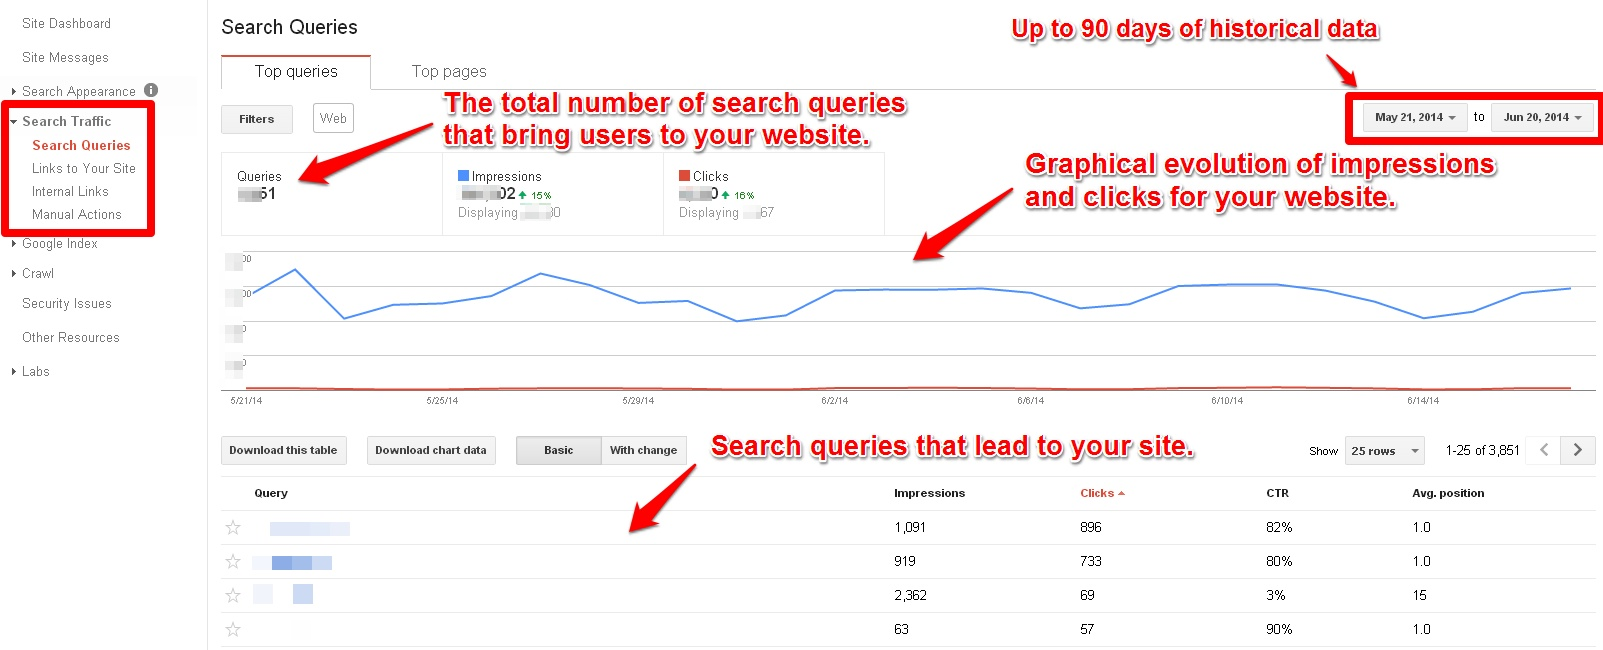 google-gwt-historical-nont-provided-ranking-data